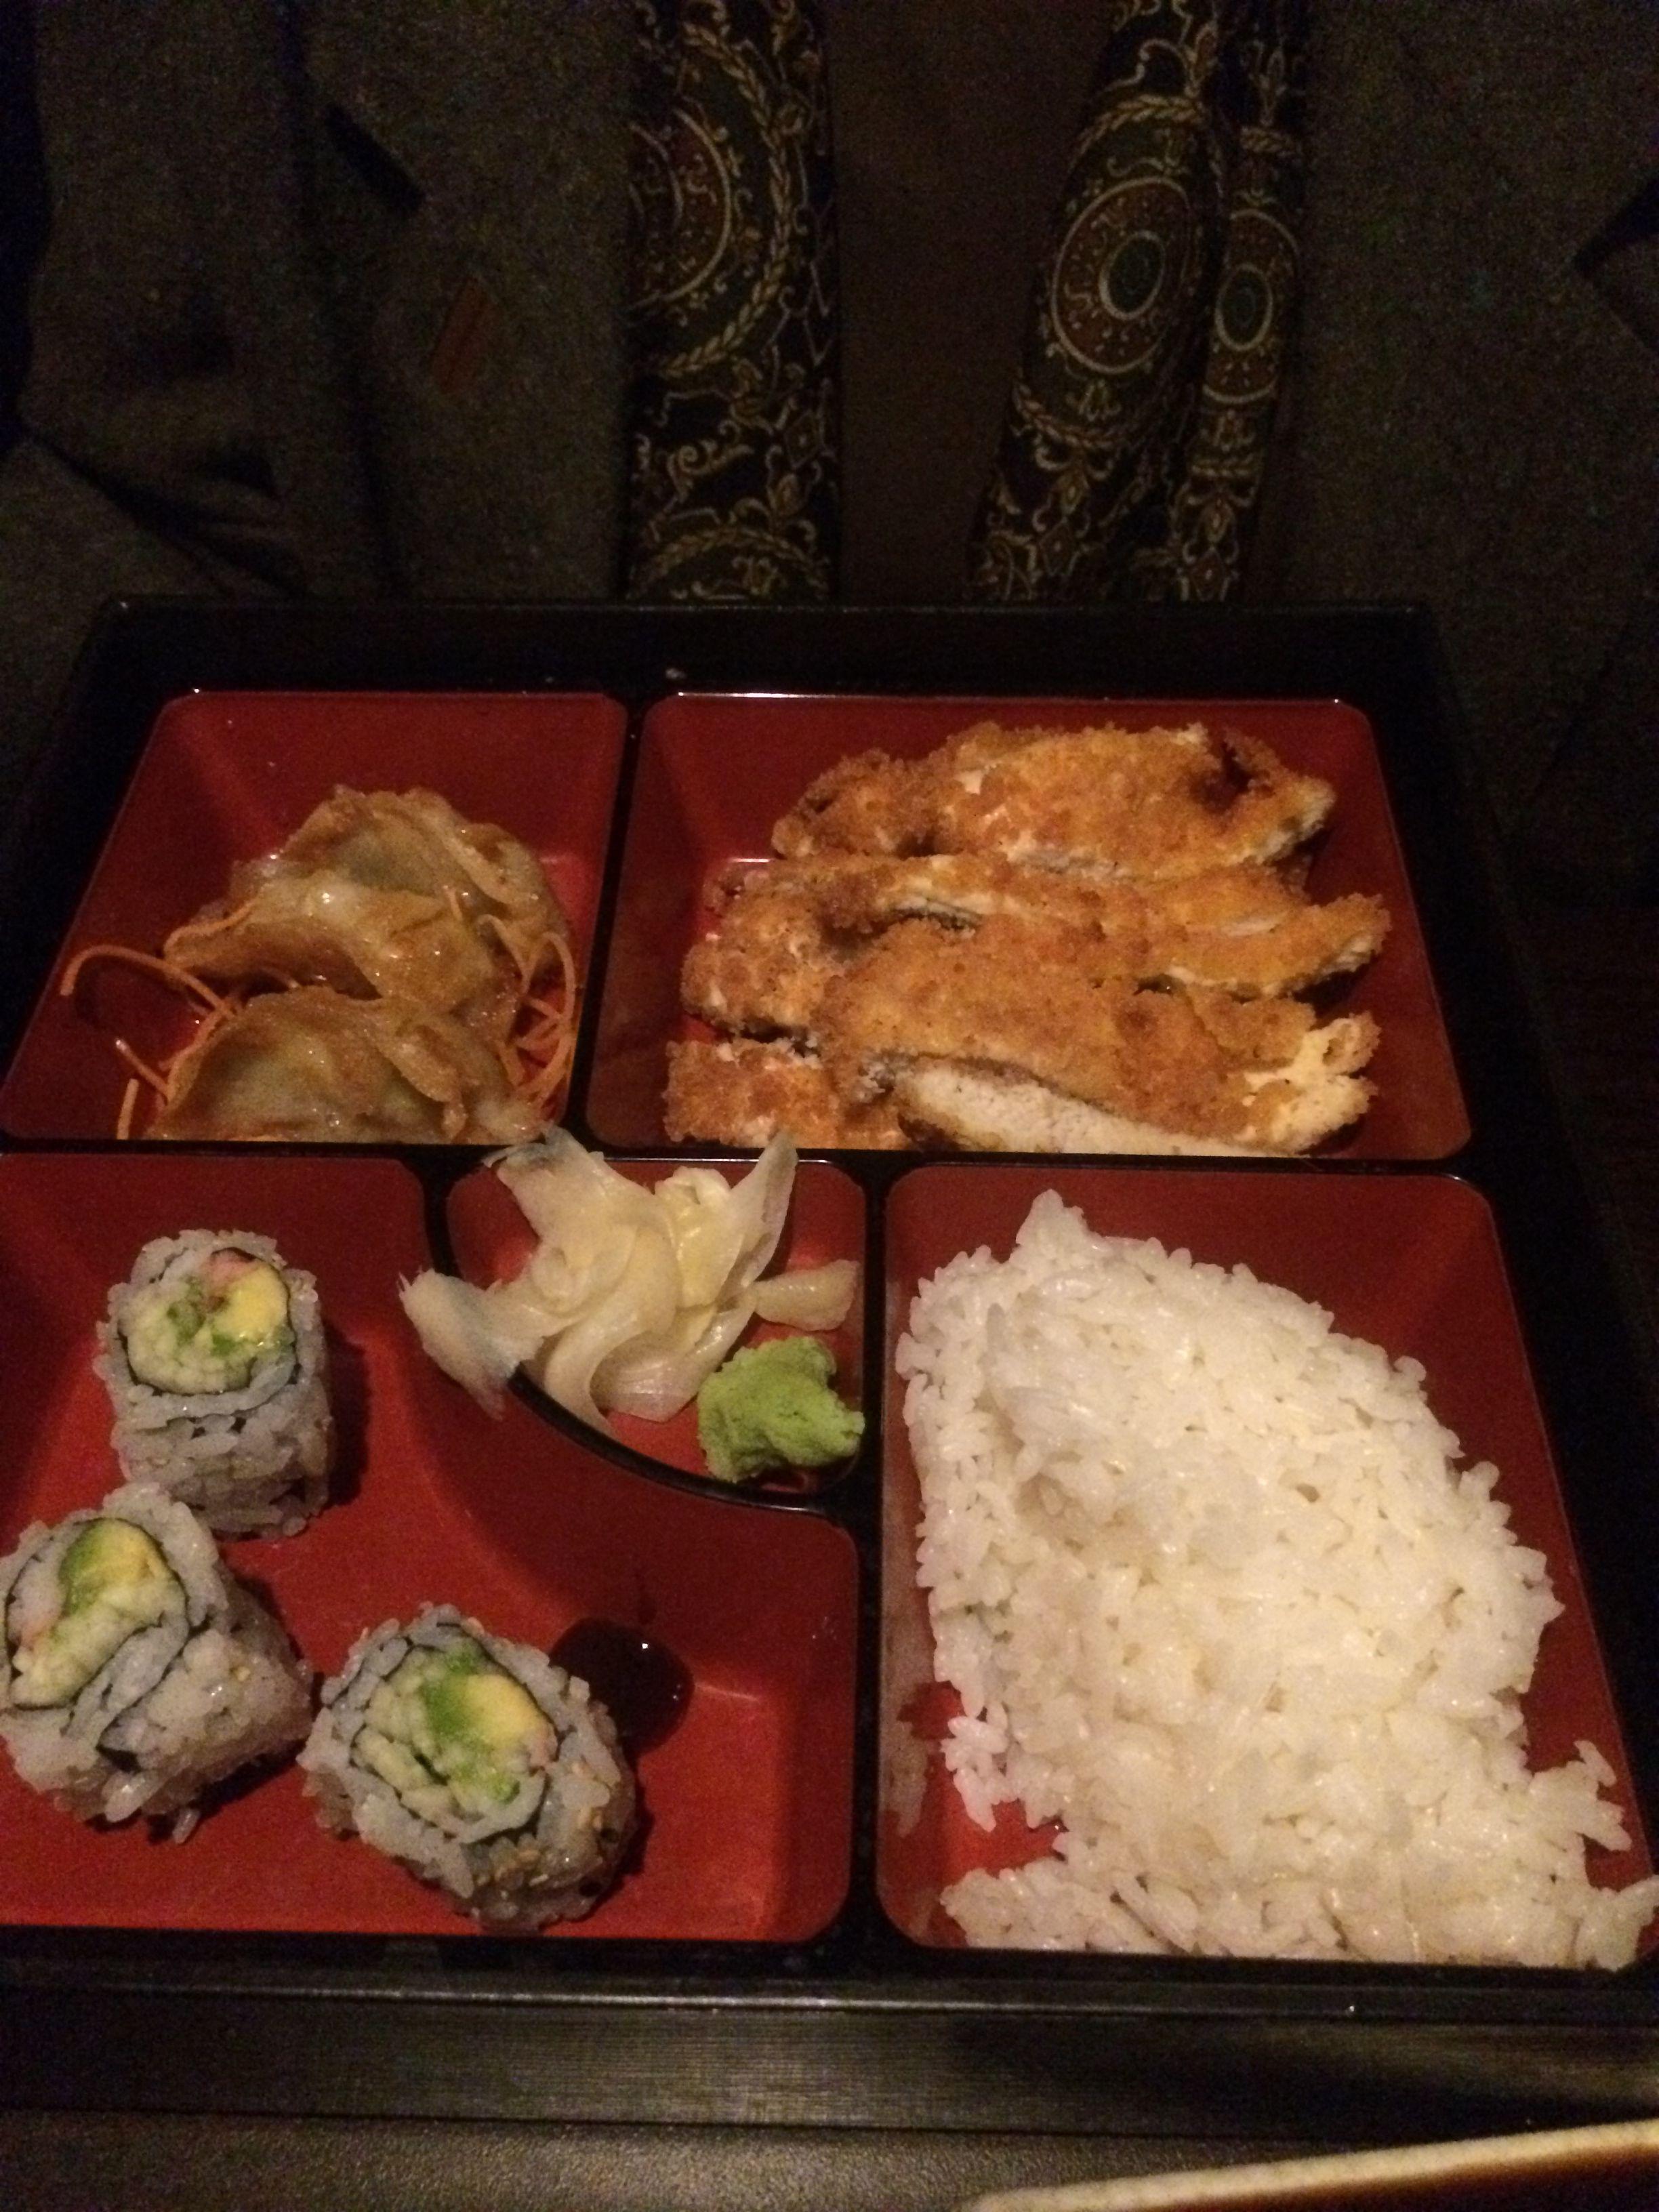 The Chicken Teriyaki Lunch Bento Box at Sakura Sushi & Steak House ...